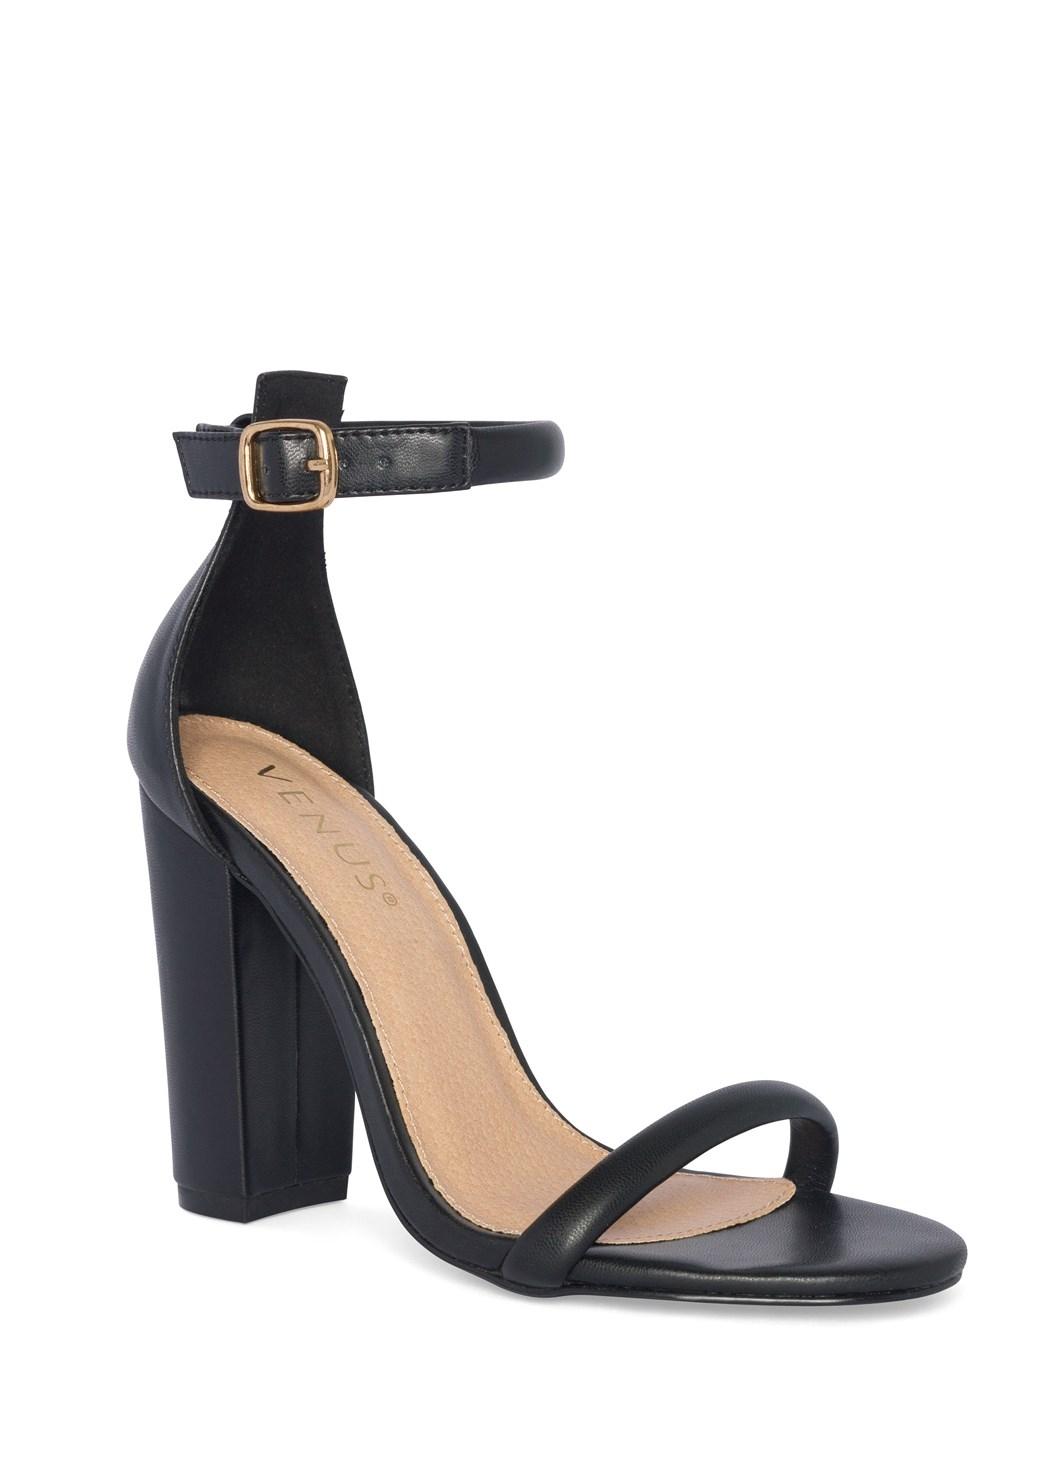 Block Heels,Ruched Asymmetrical Top,Raffia Hoop Earrings,Wicker Straw Bag